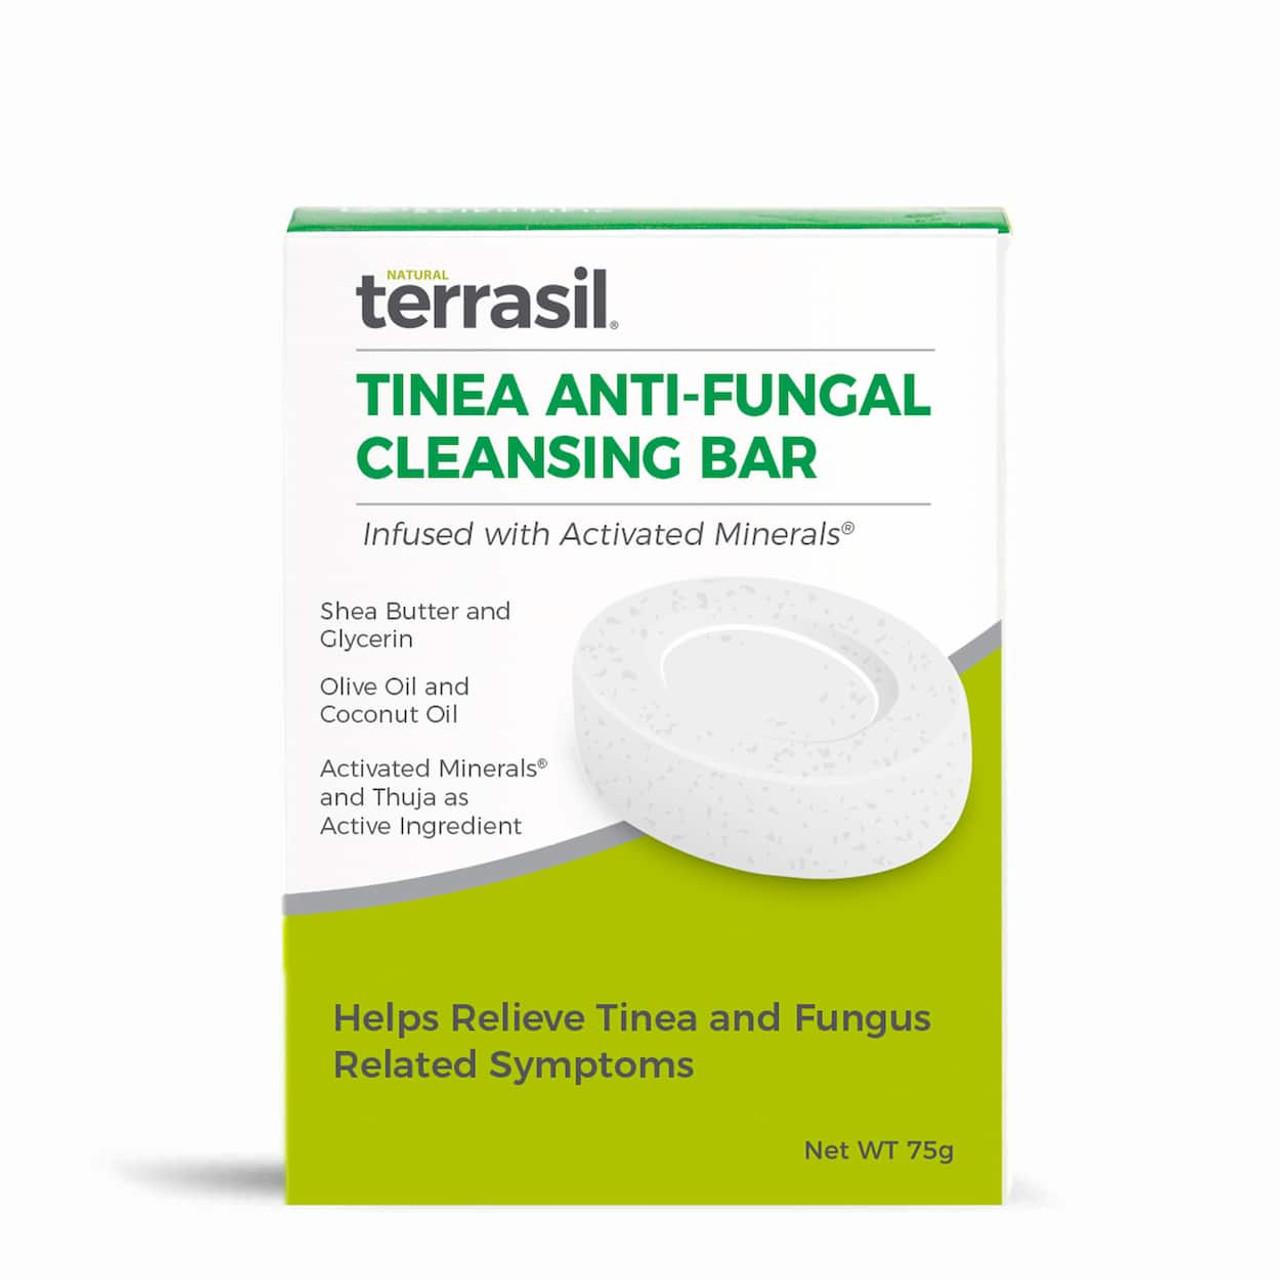 Tinea Anti-Fungal Cleansing Bar